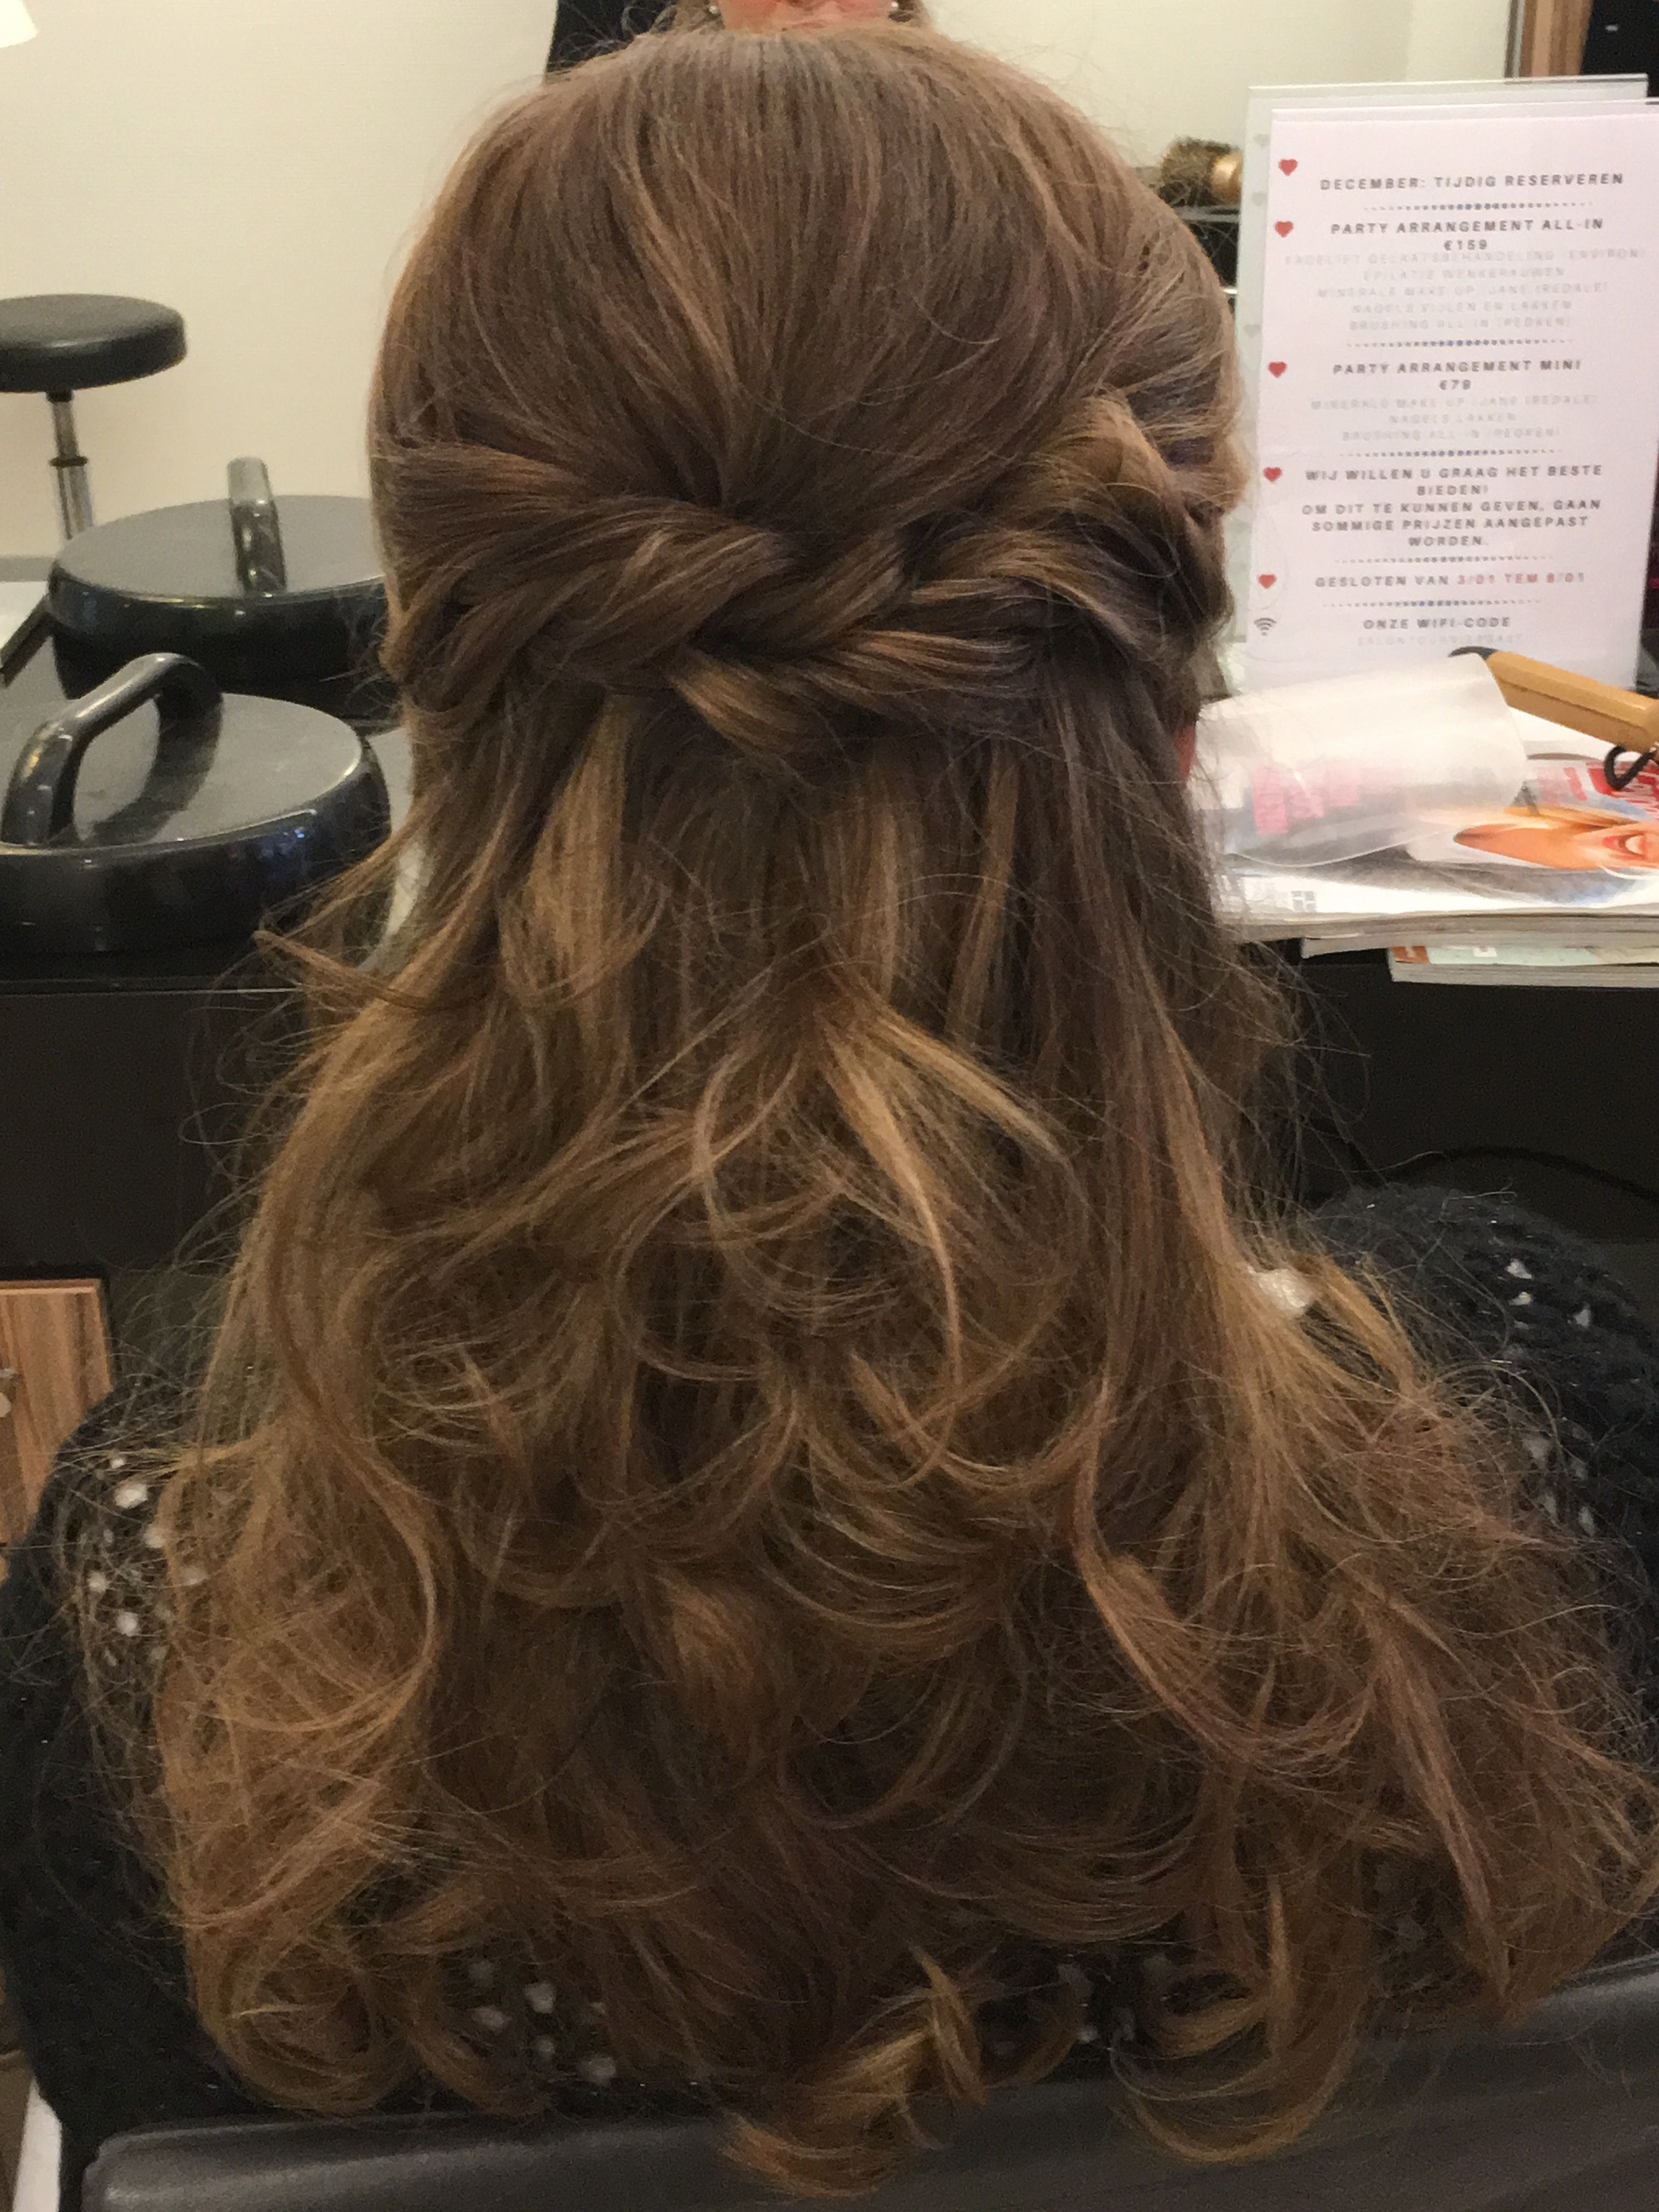 Curls , half opgestoken haar | Kapsels Salon Tournier in ... Everyday Hairstyles For Teenage Girls